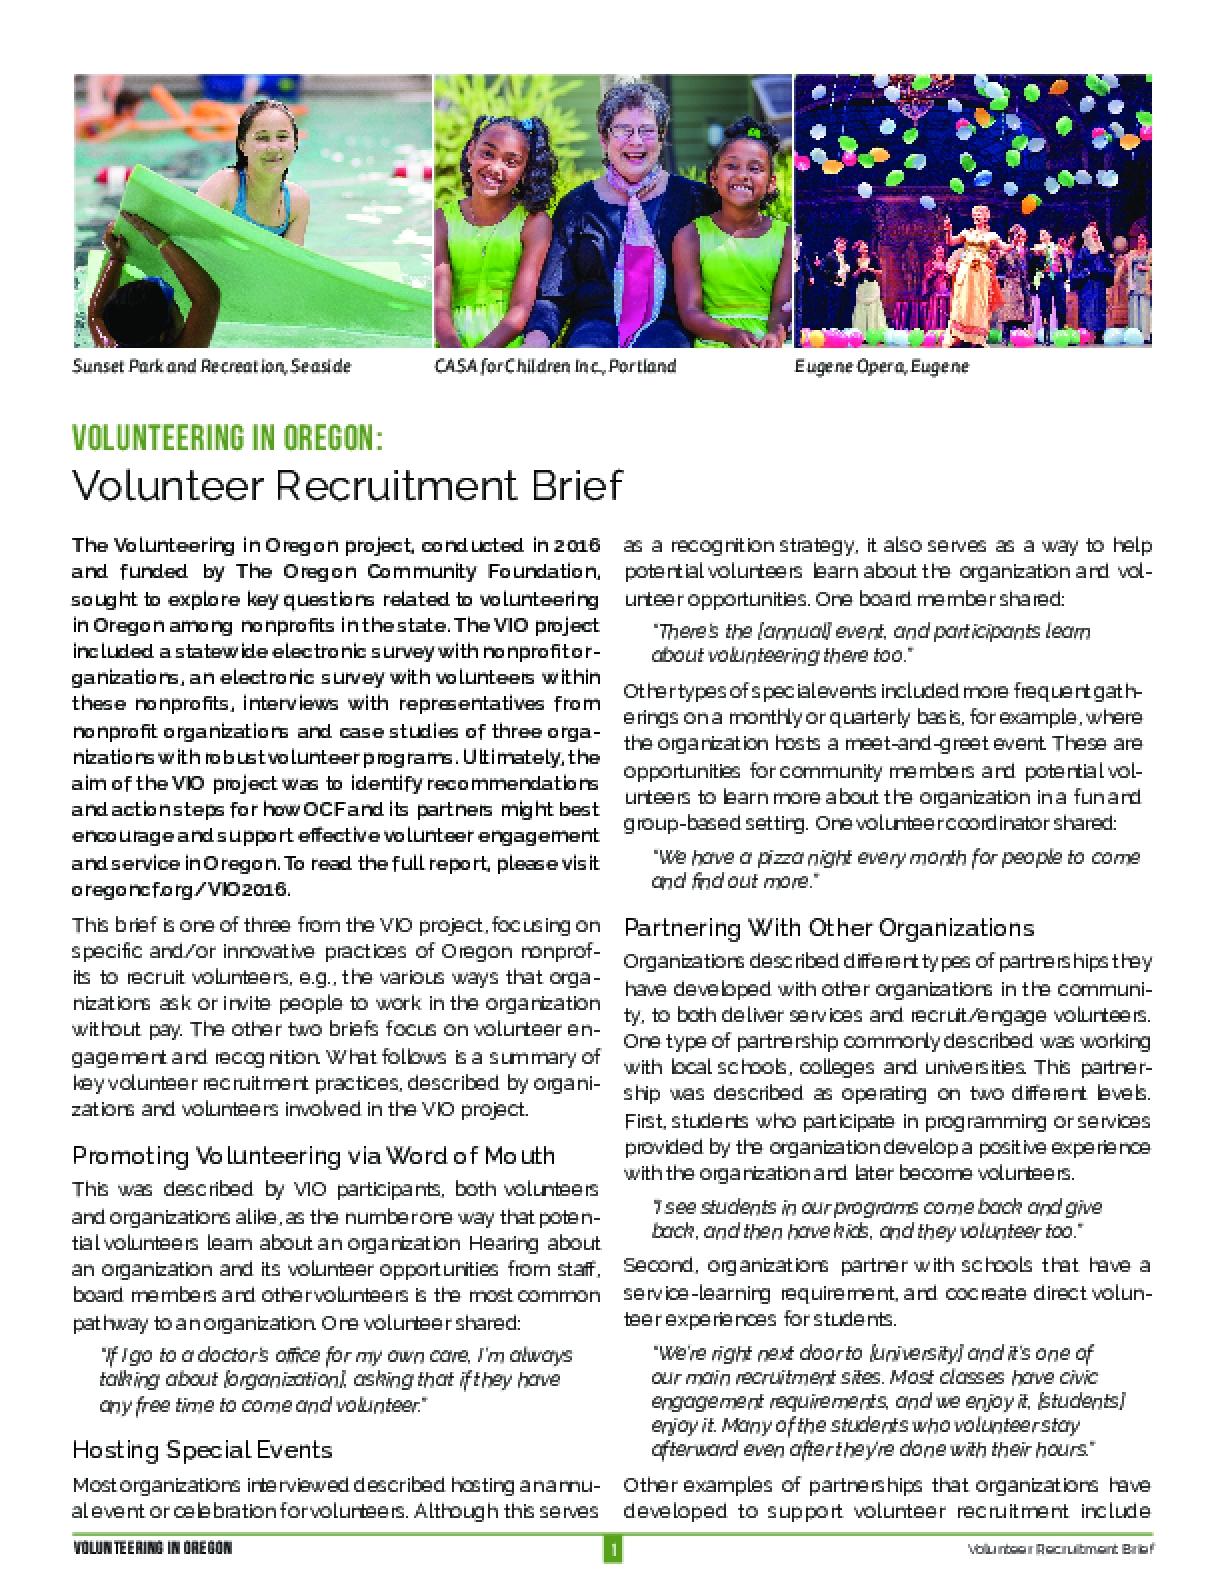 Volunteering in Oregon: Volunteer Recruitment Brief